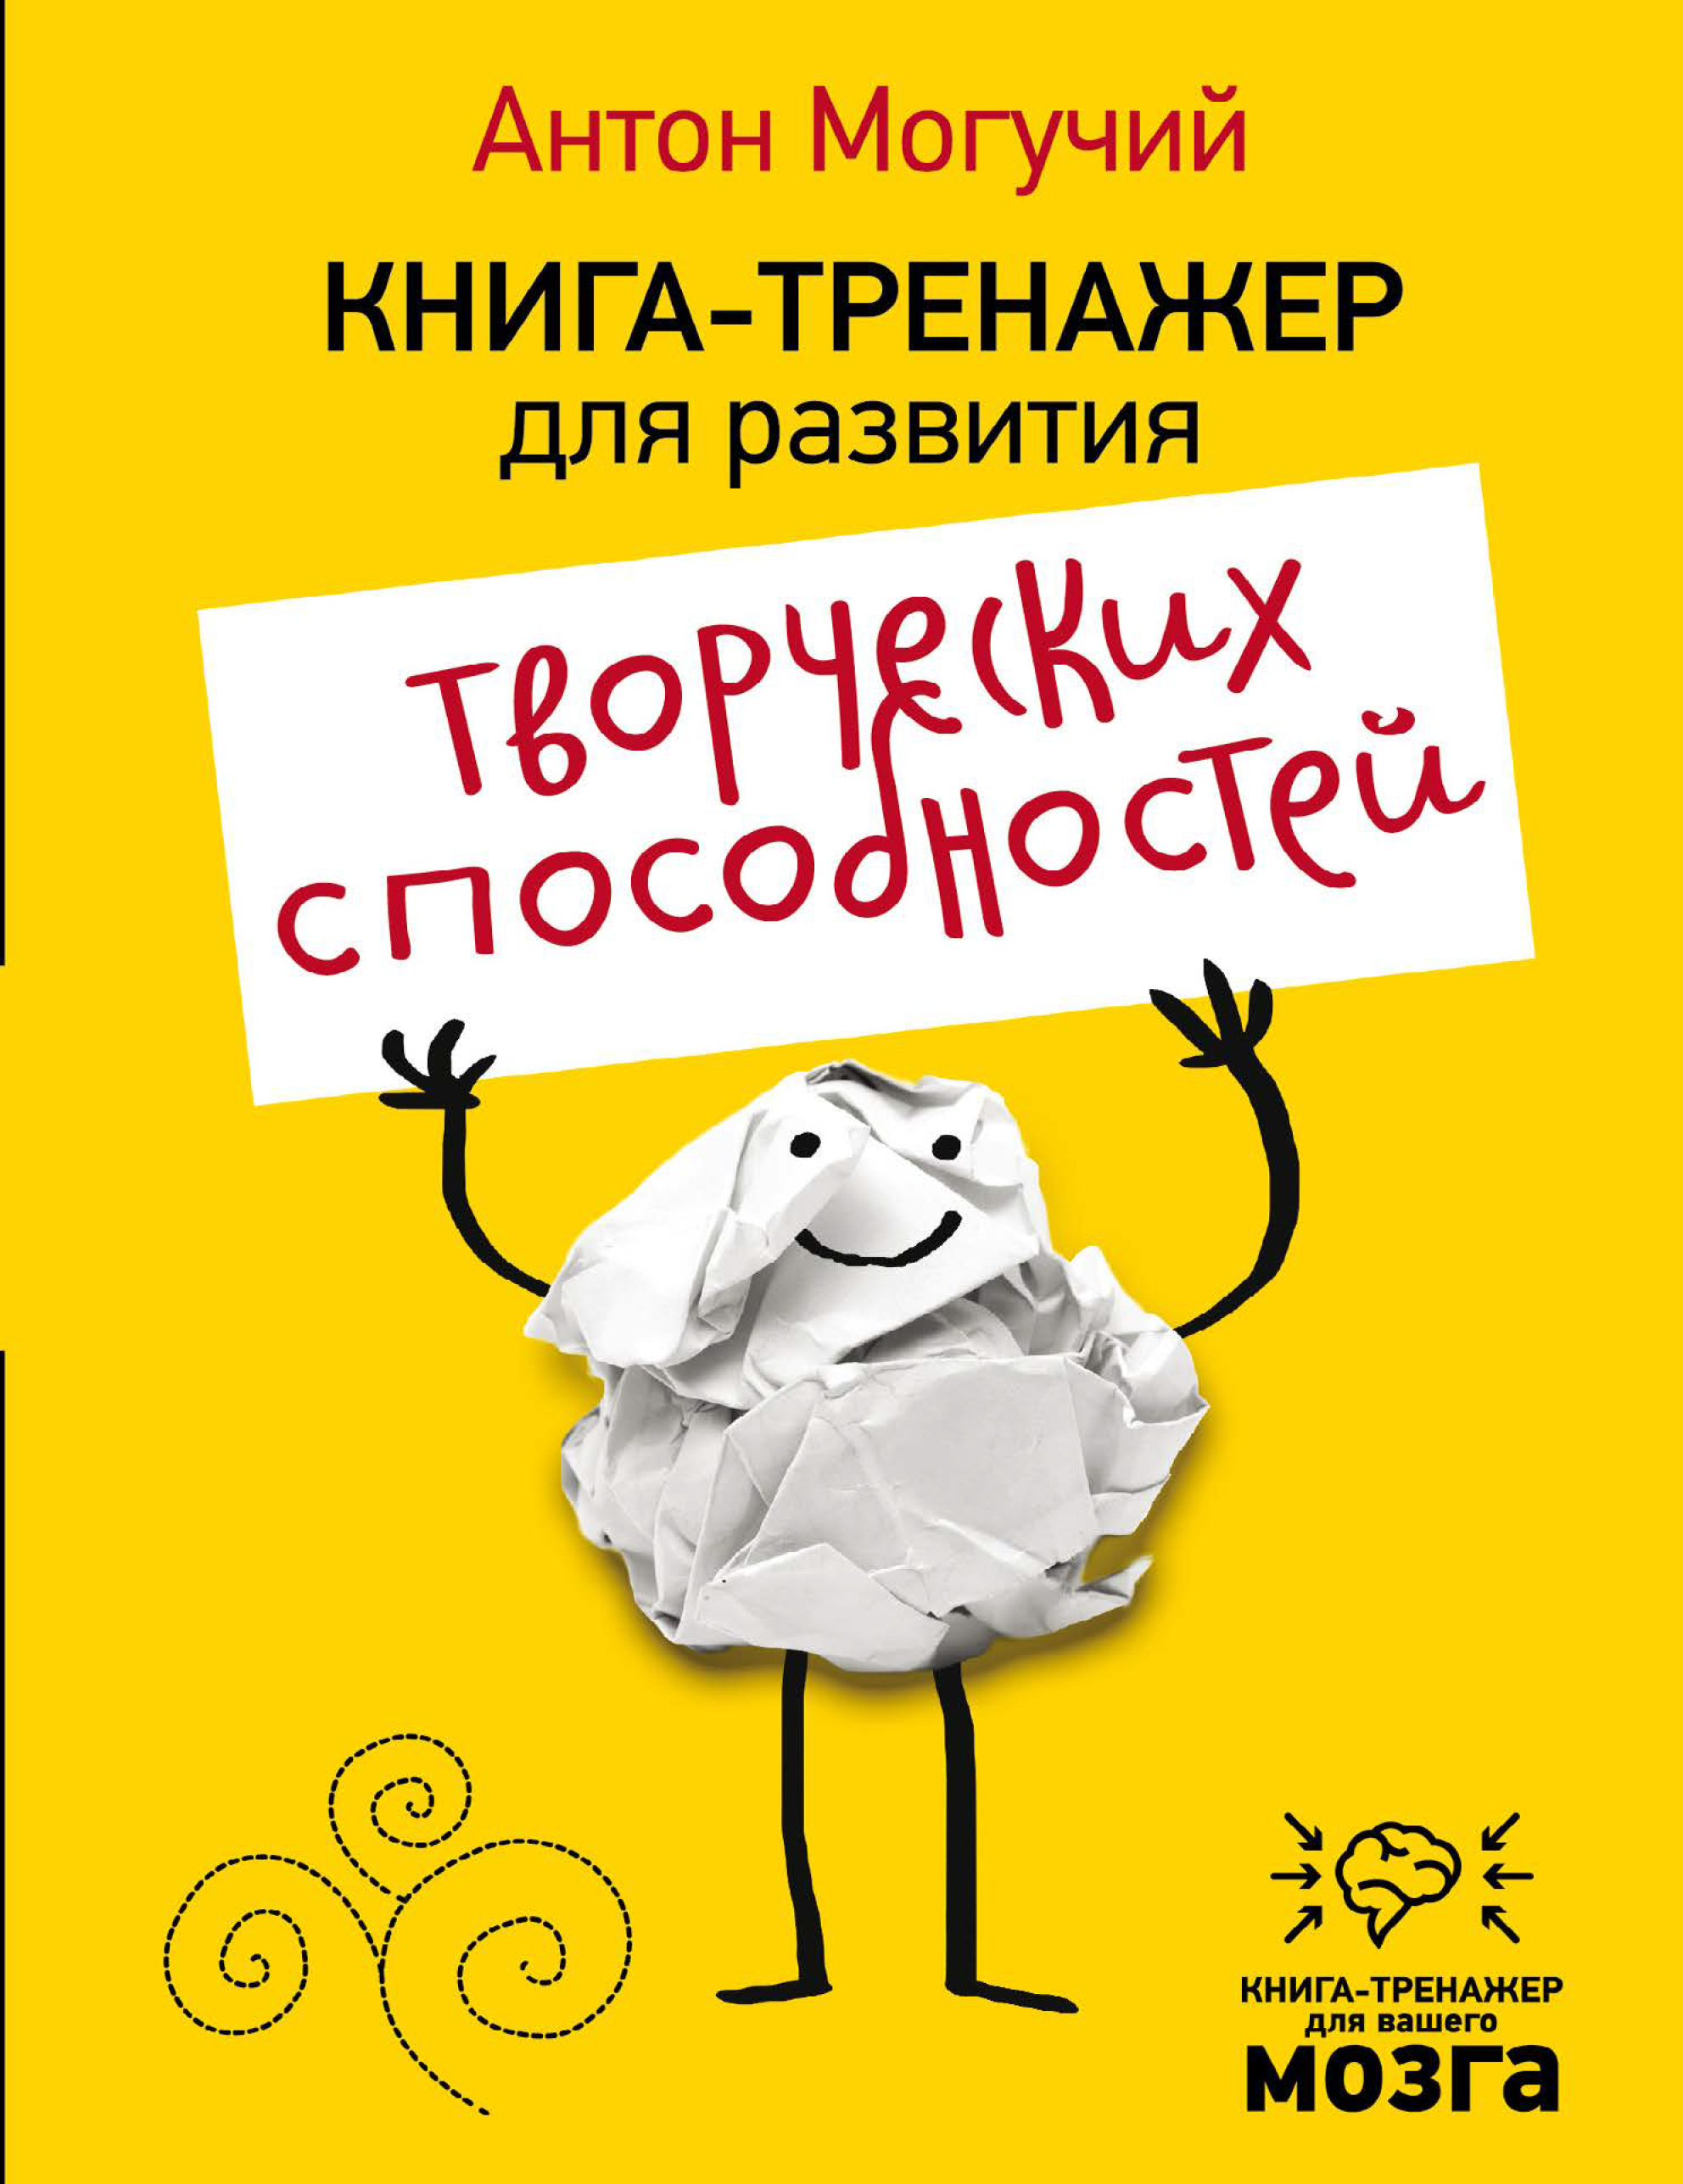 цена на Антон Могучий Книга-тренажер для развития творческих способностей